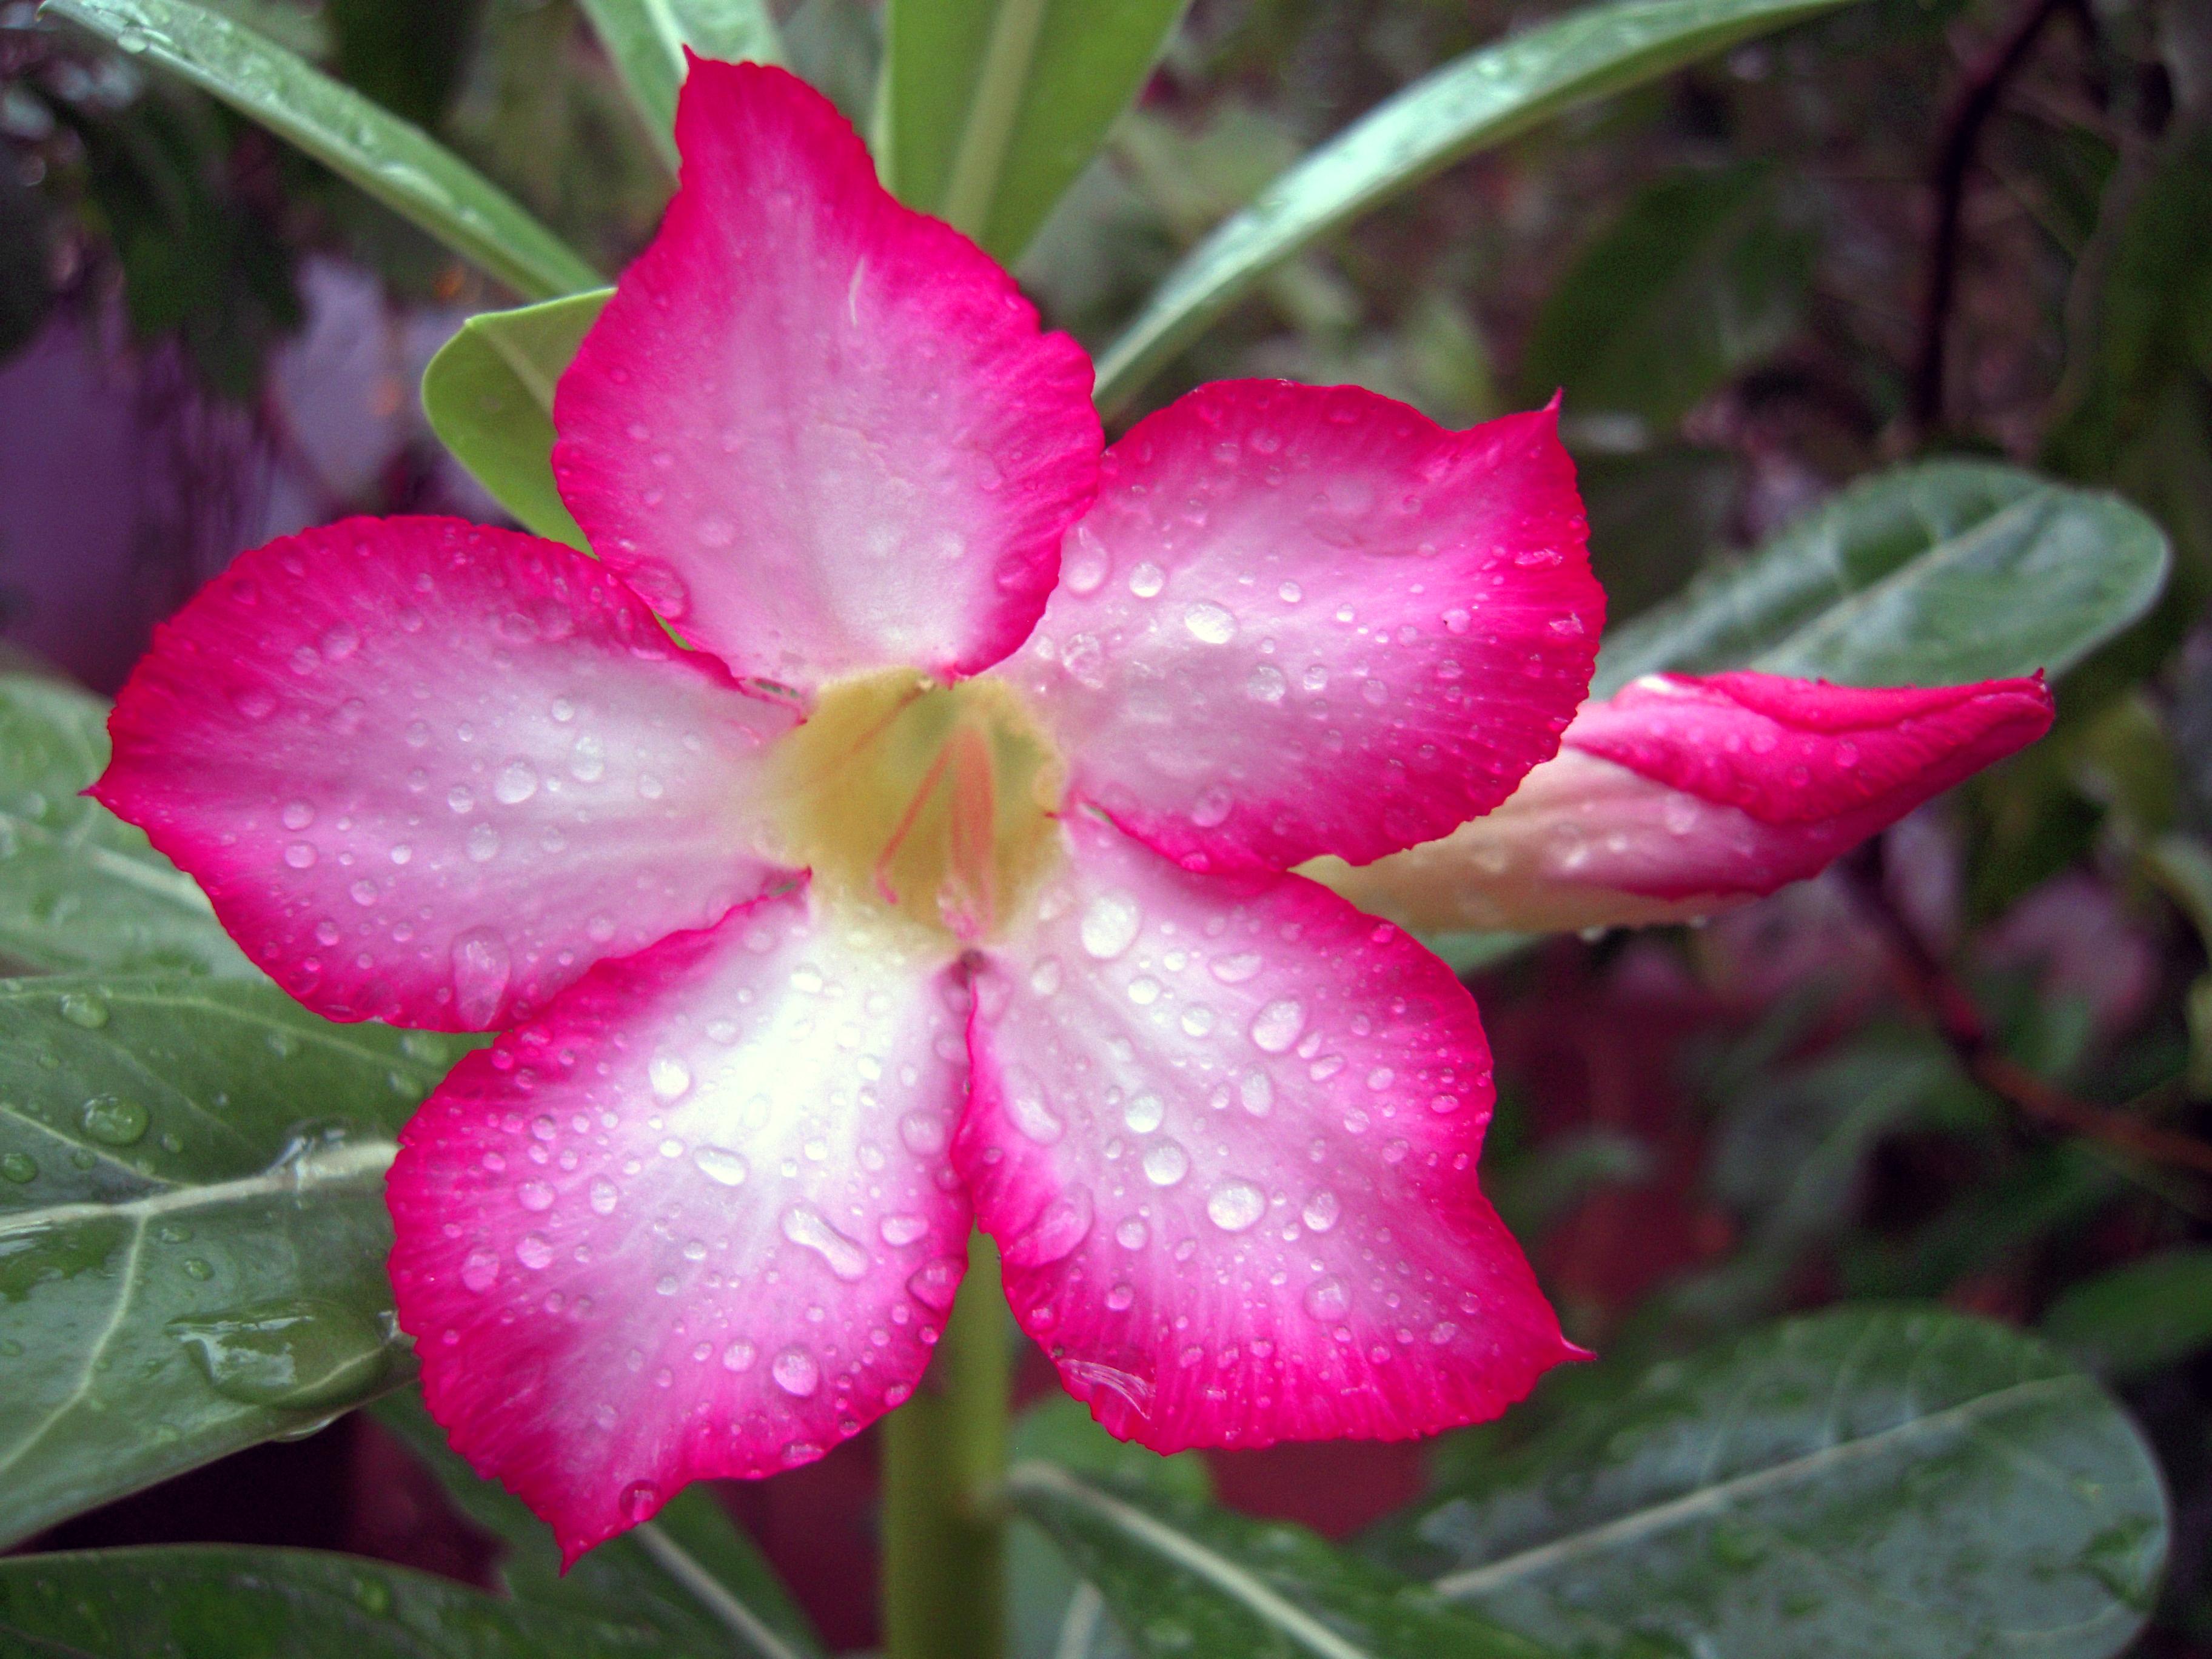 5 common poisonous plants in hawaii image credits desert rose izmirmasajfo Choice Image